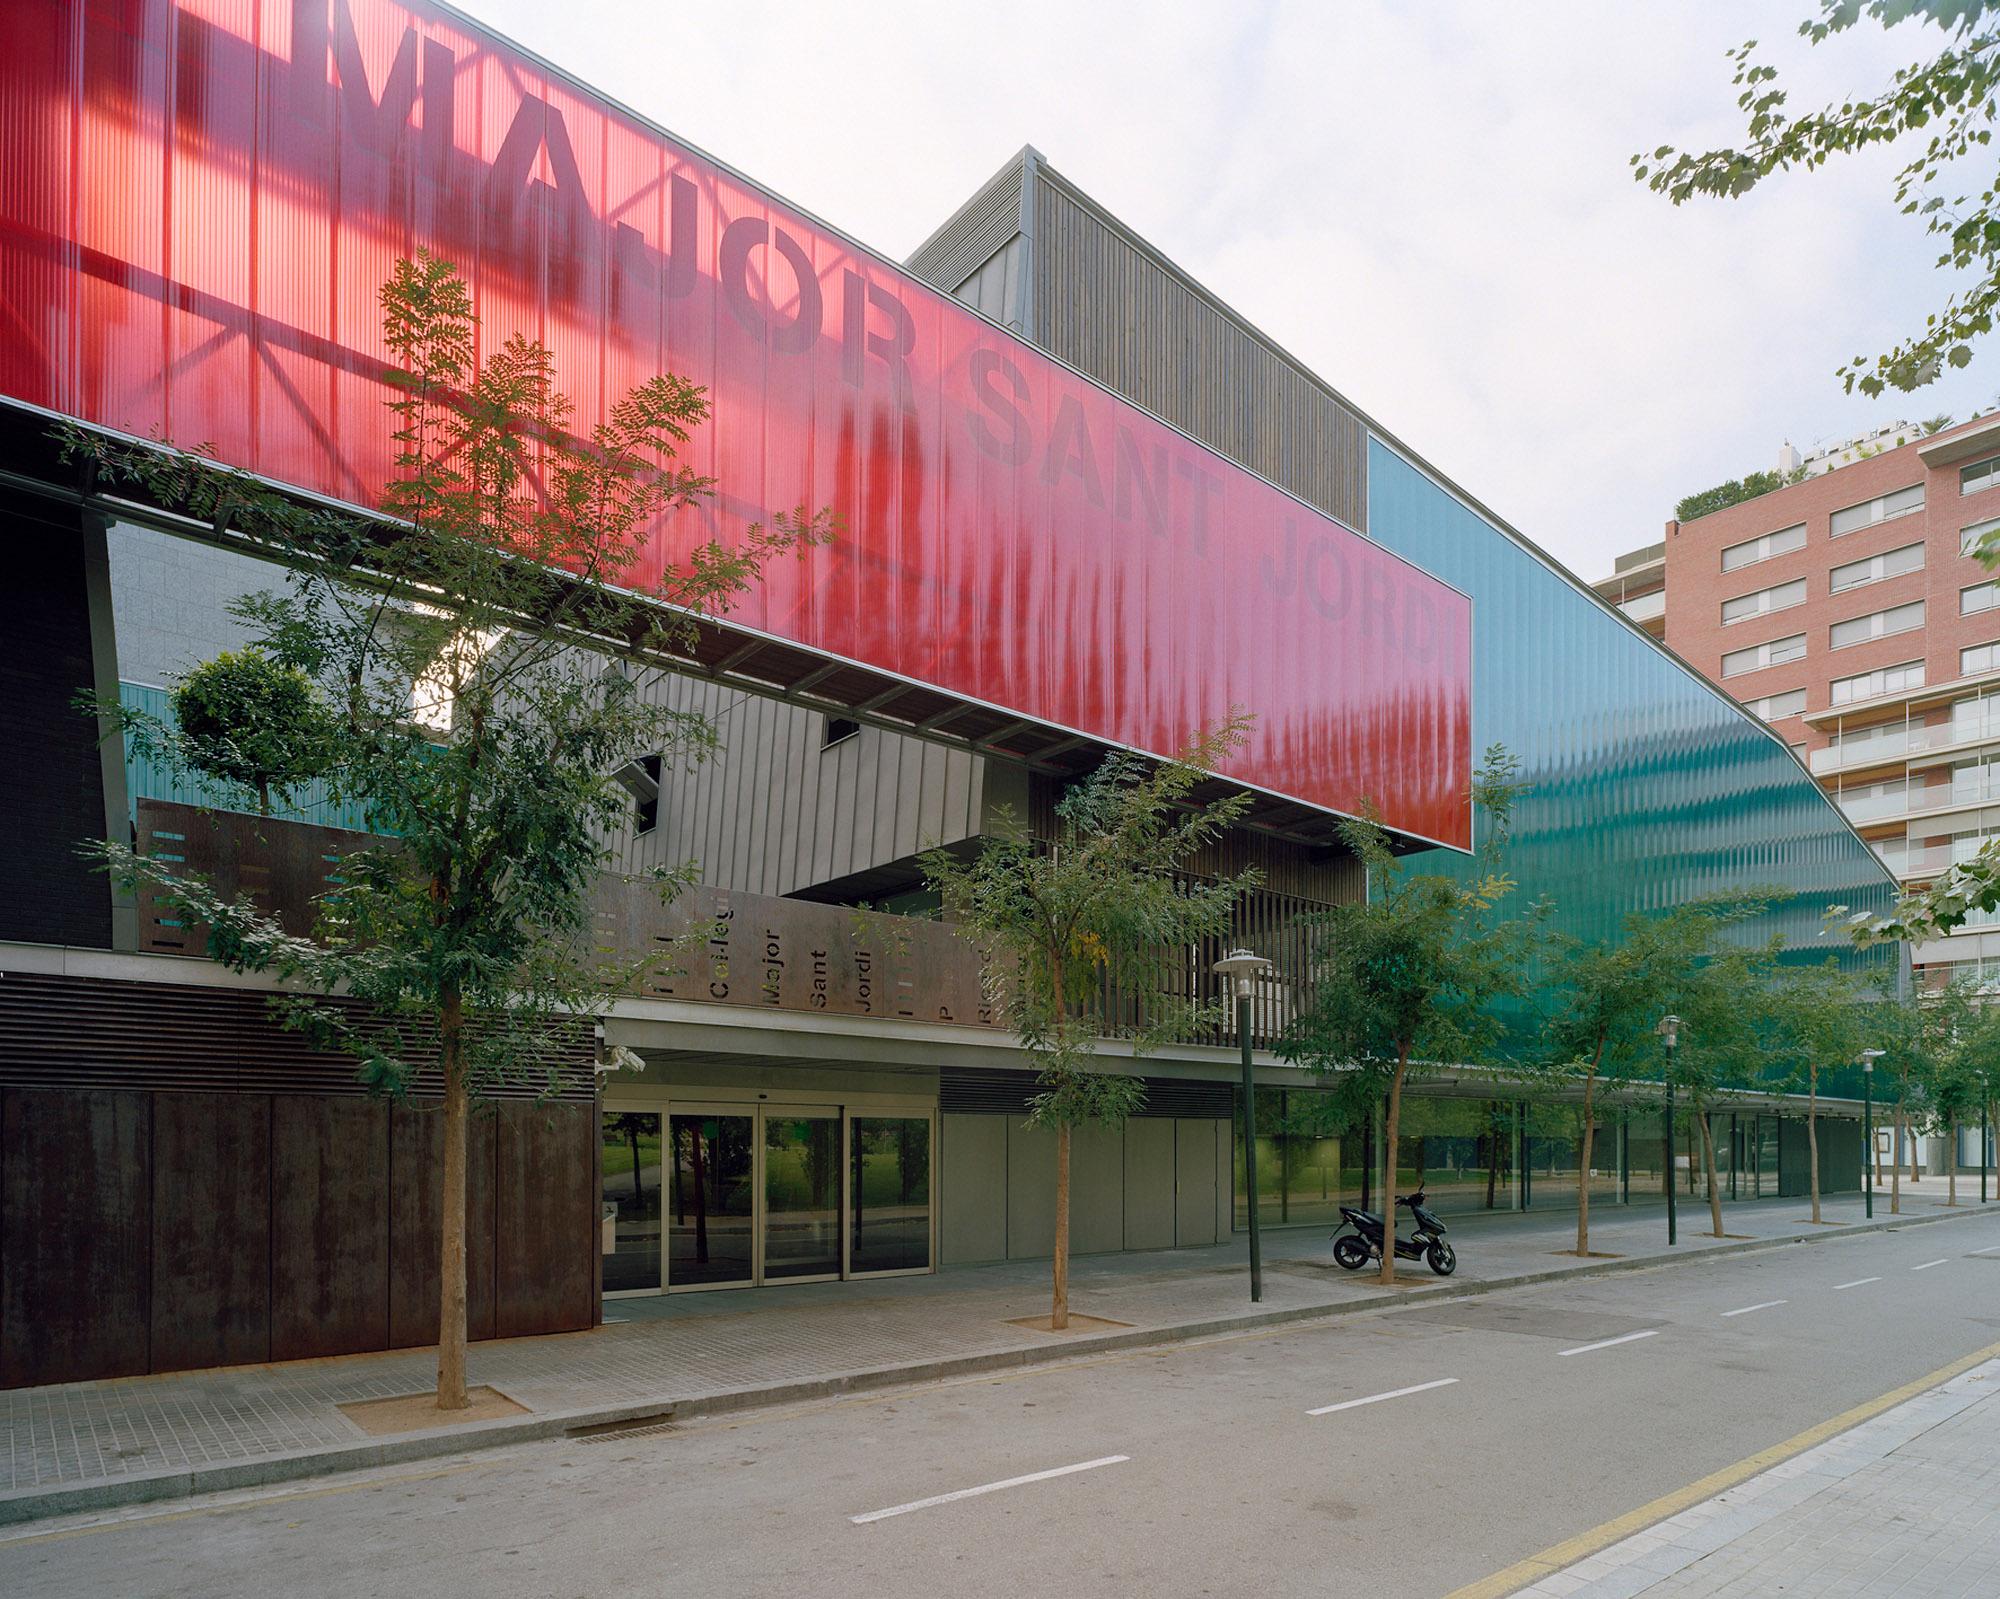 Building for the Students' house Sant Jordi in Barcelona